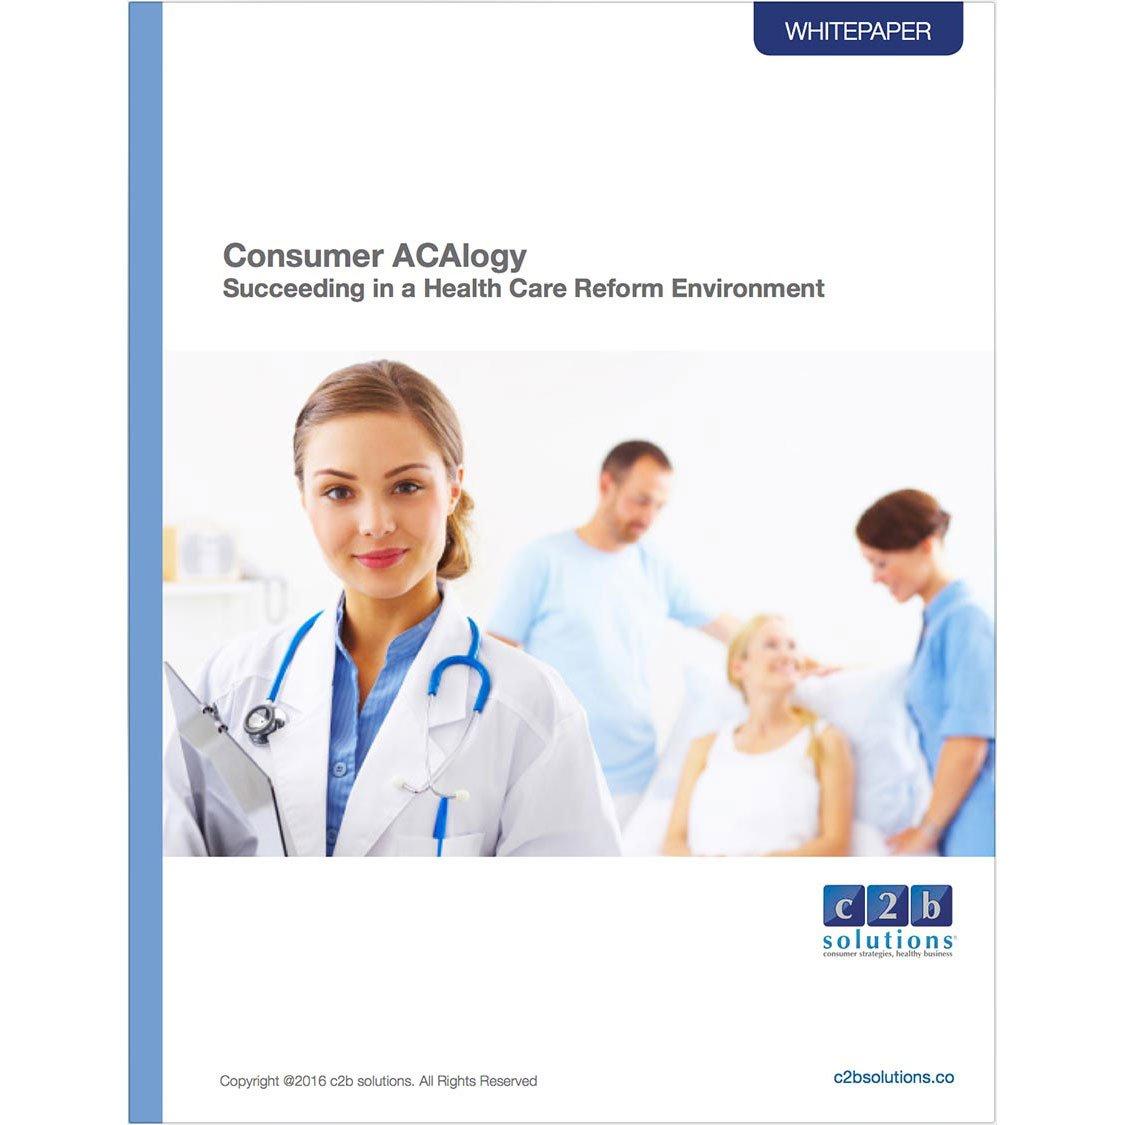 Consumer ACAlogy Whitepapter